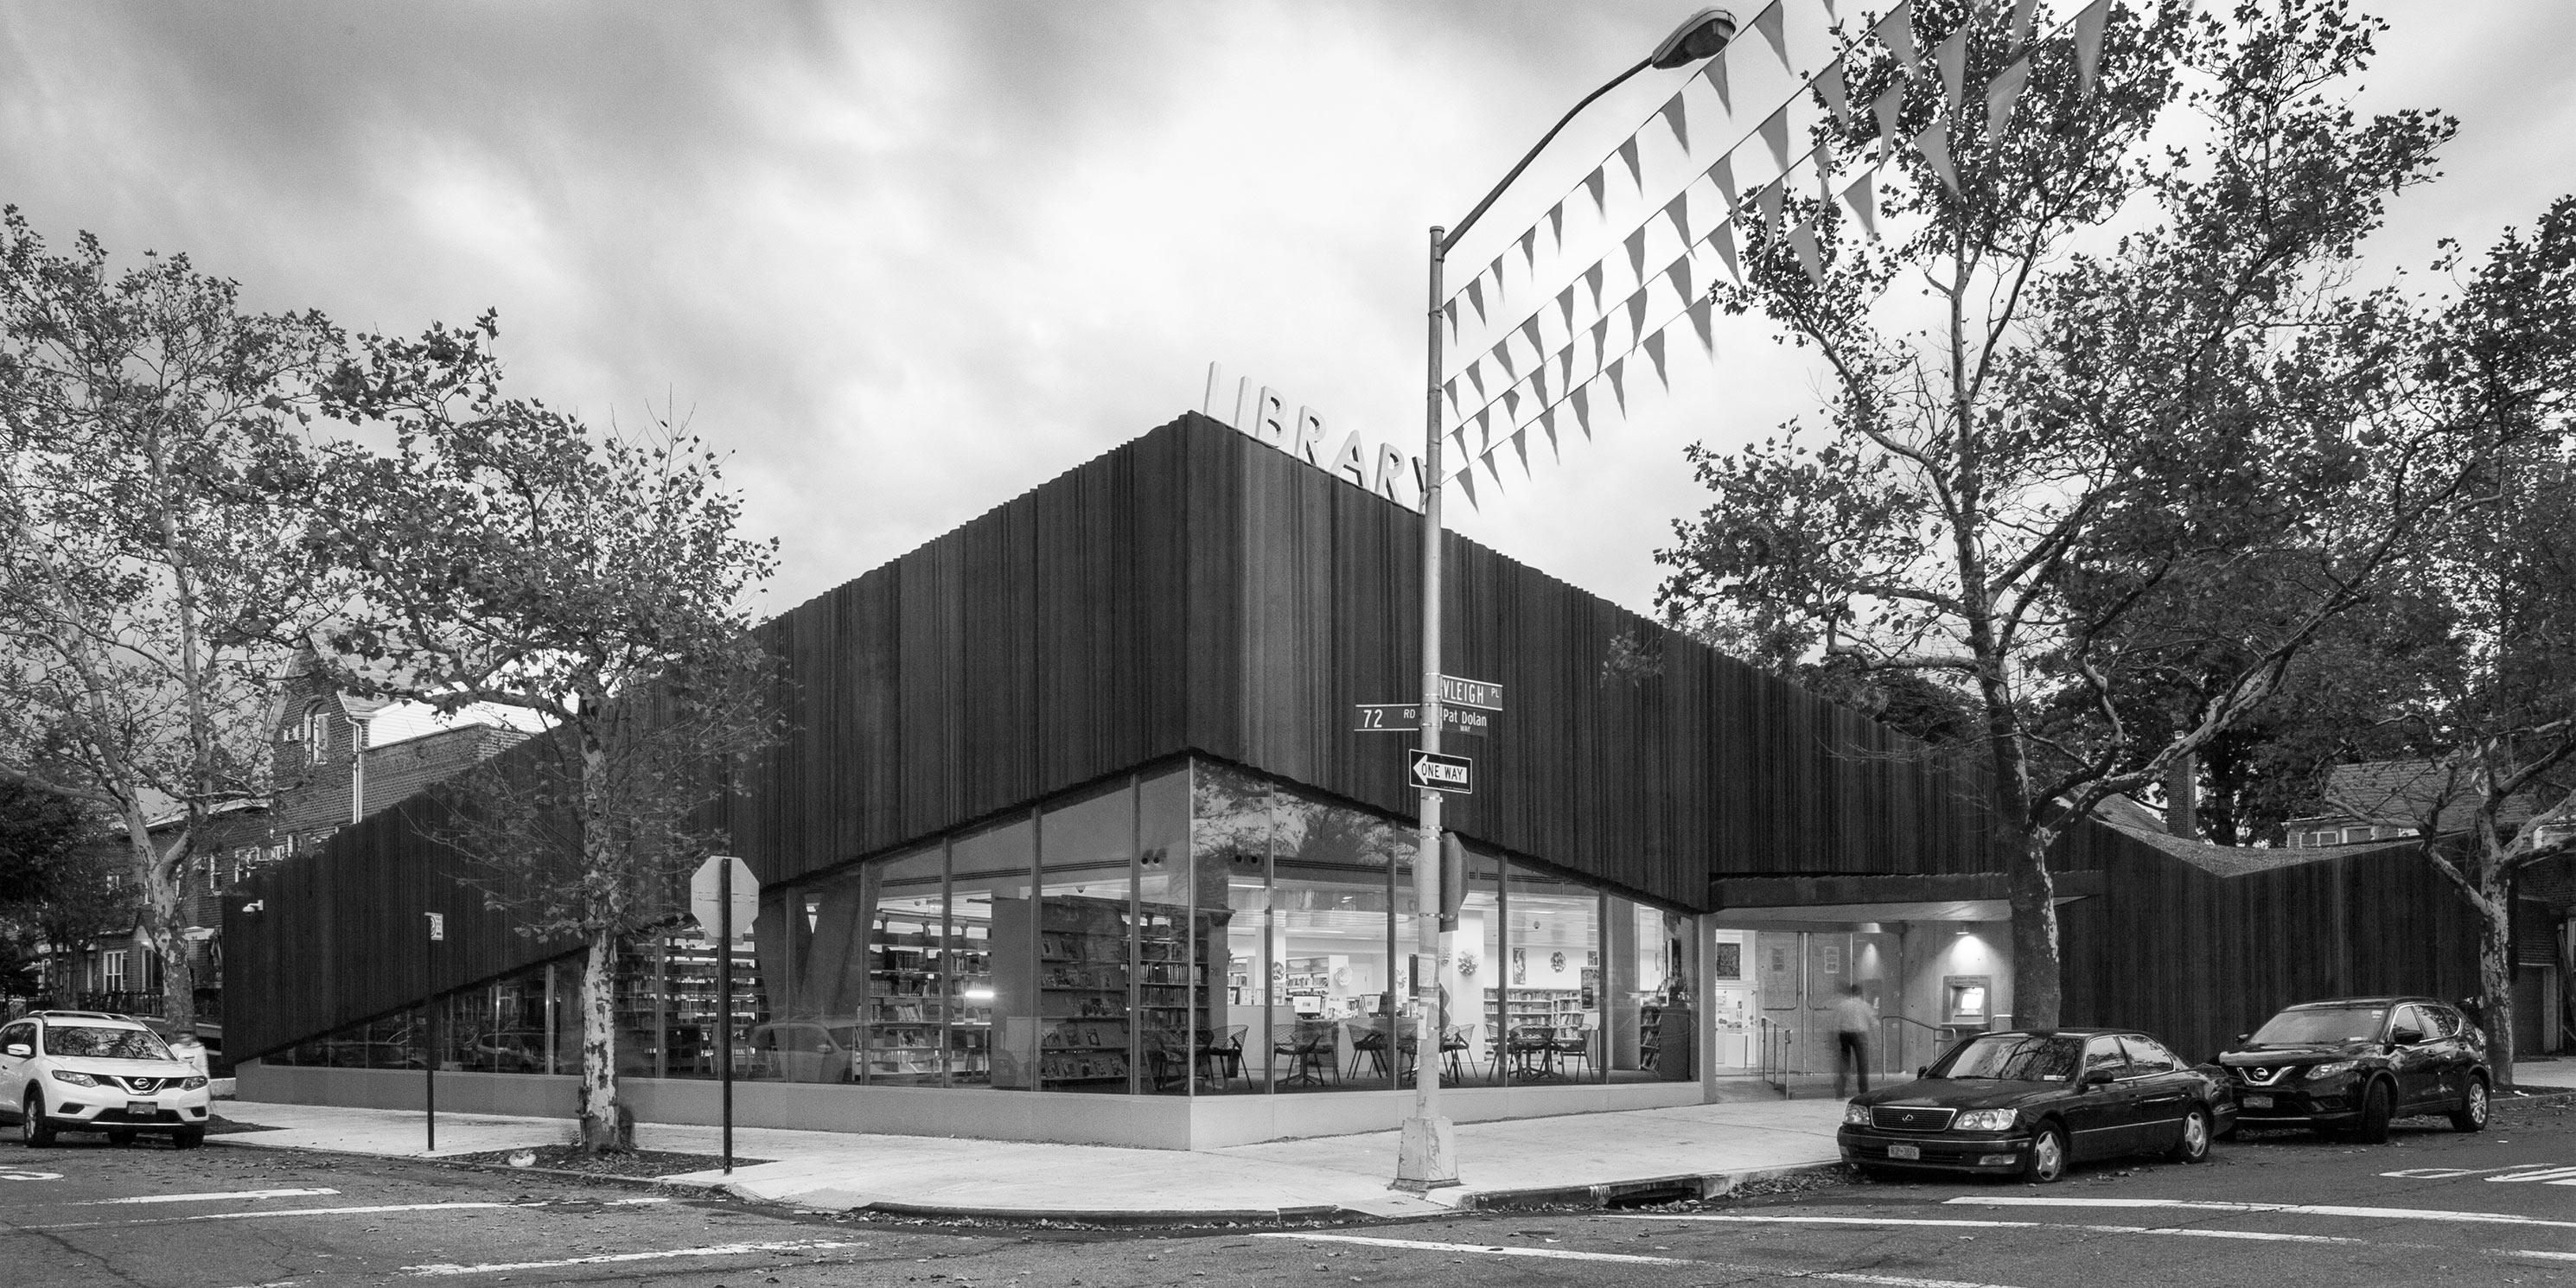 2018 MASterworks Best New Urban Amenity: Kew Gardens Hills Library